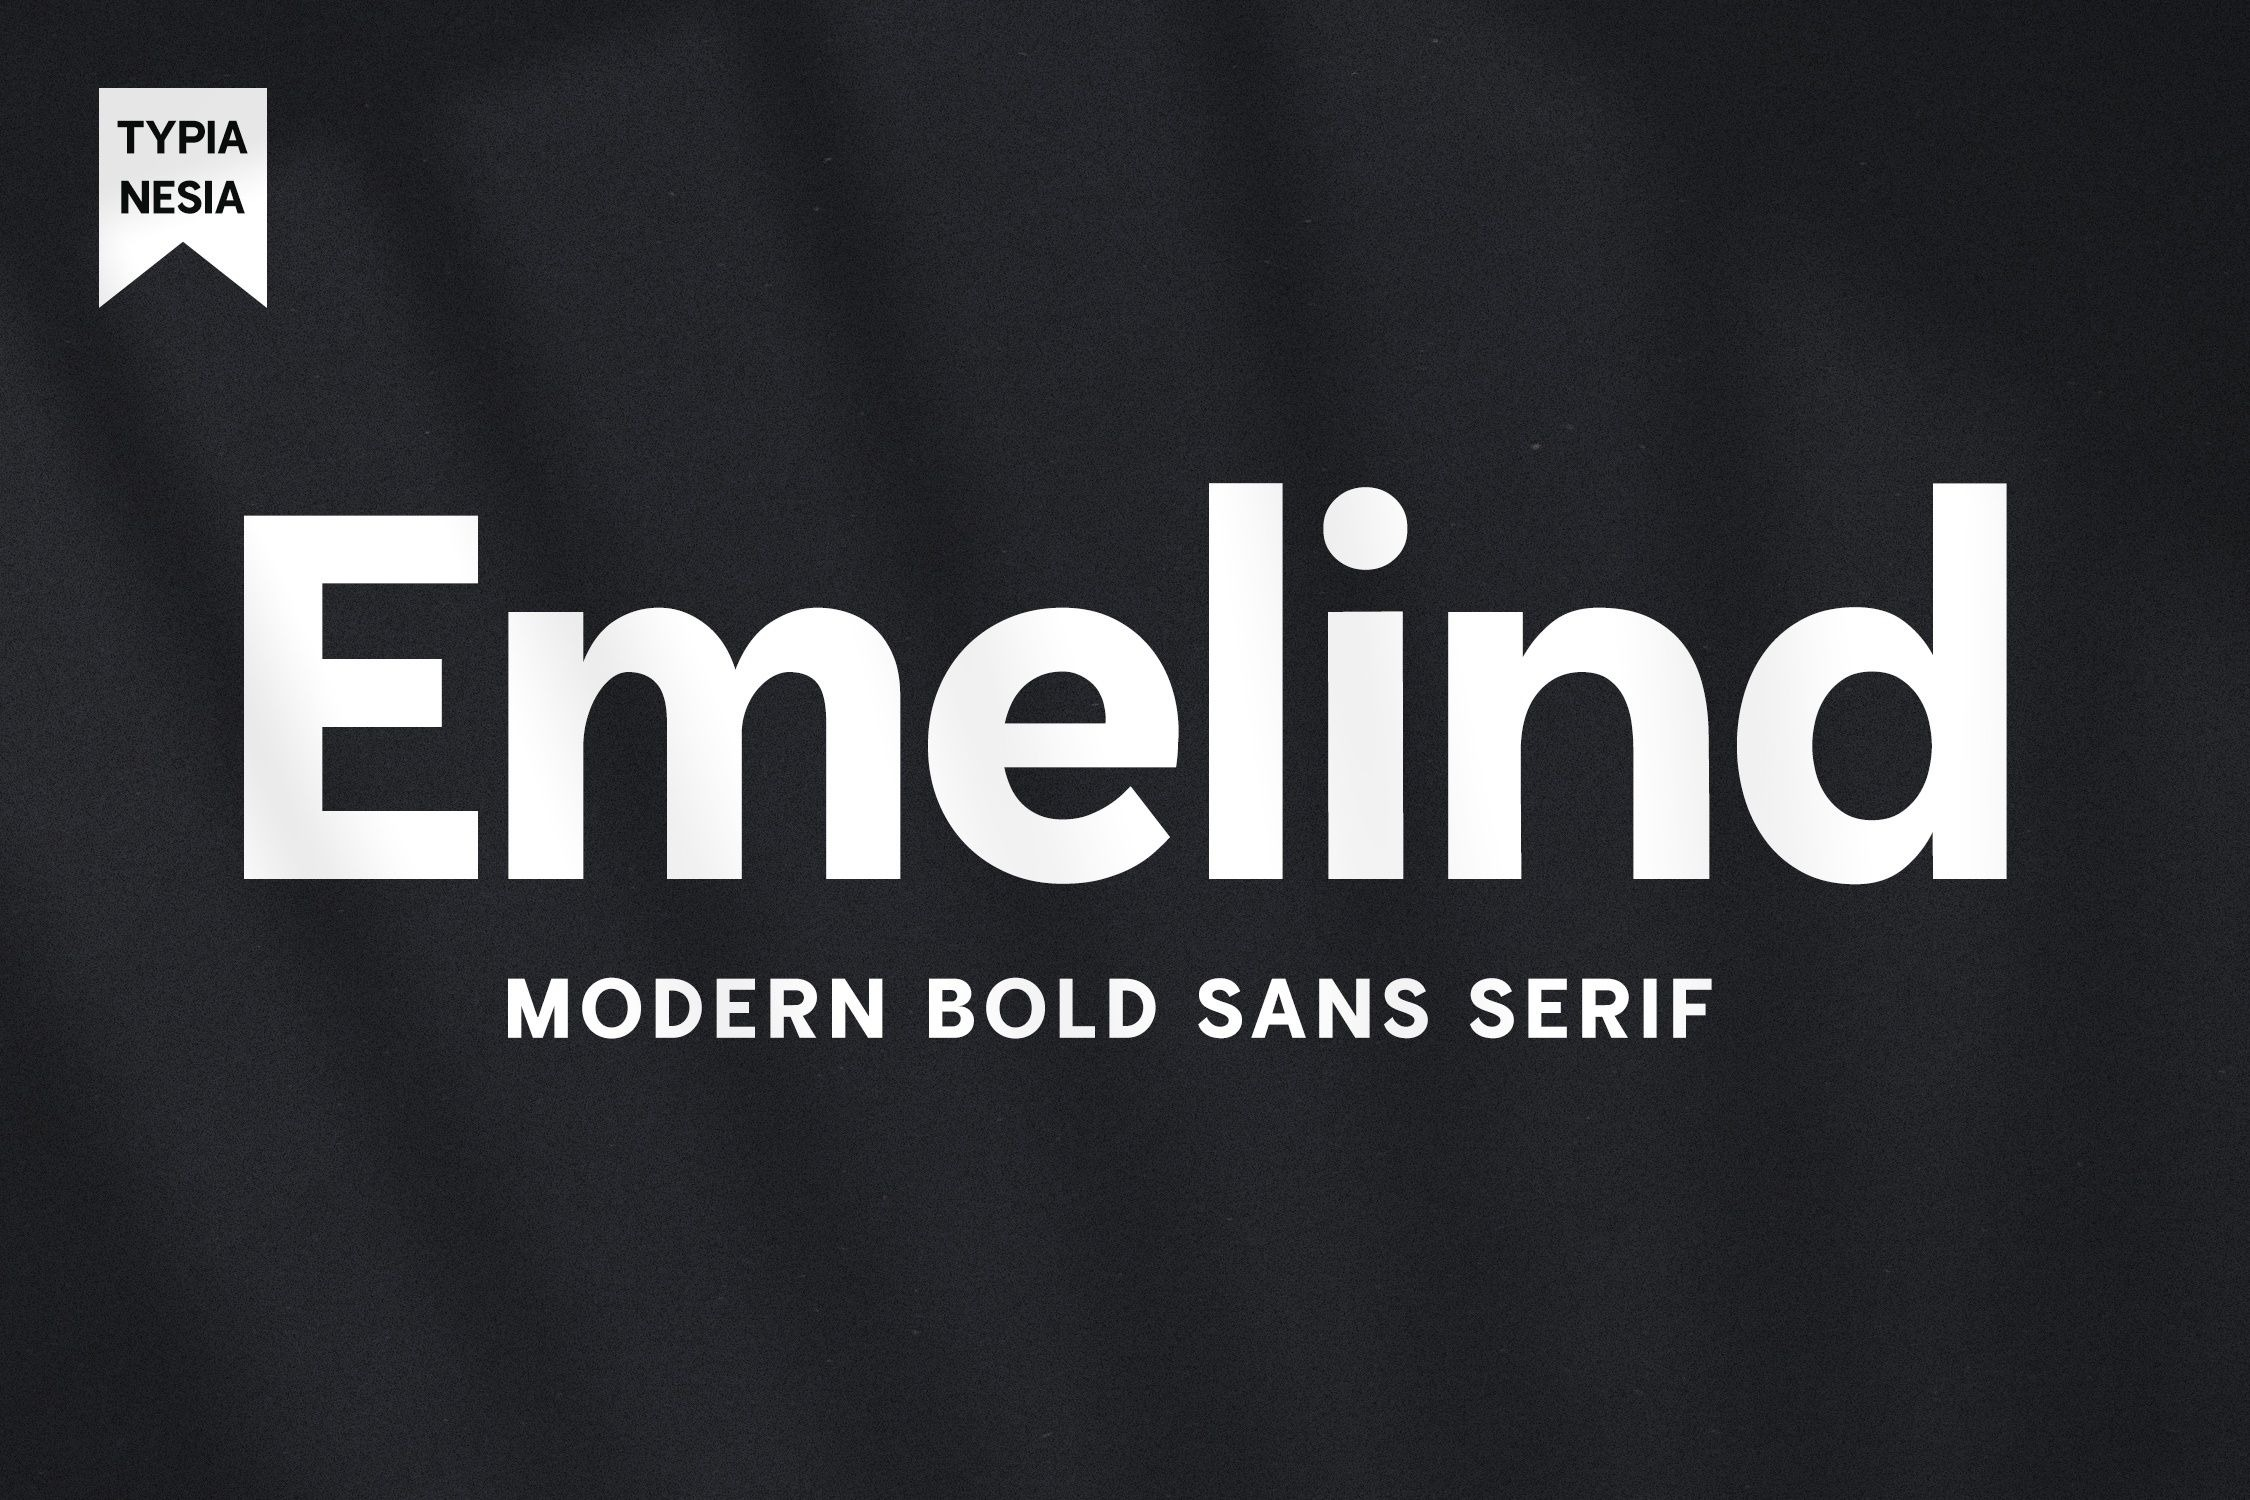 Emelind Modern Bold Sans Serif Font -1 (1)